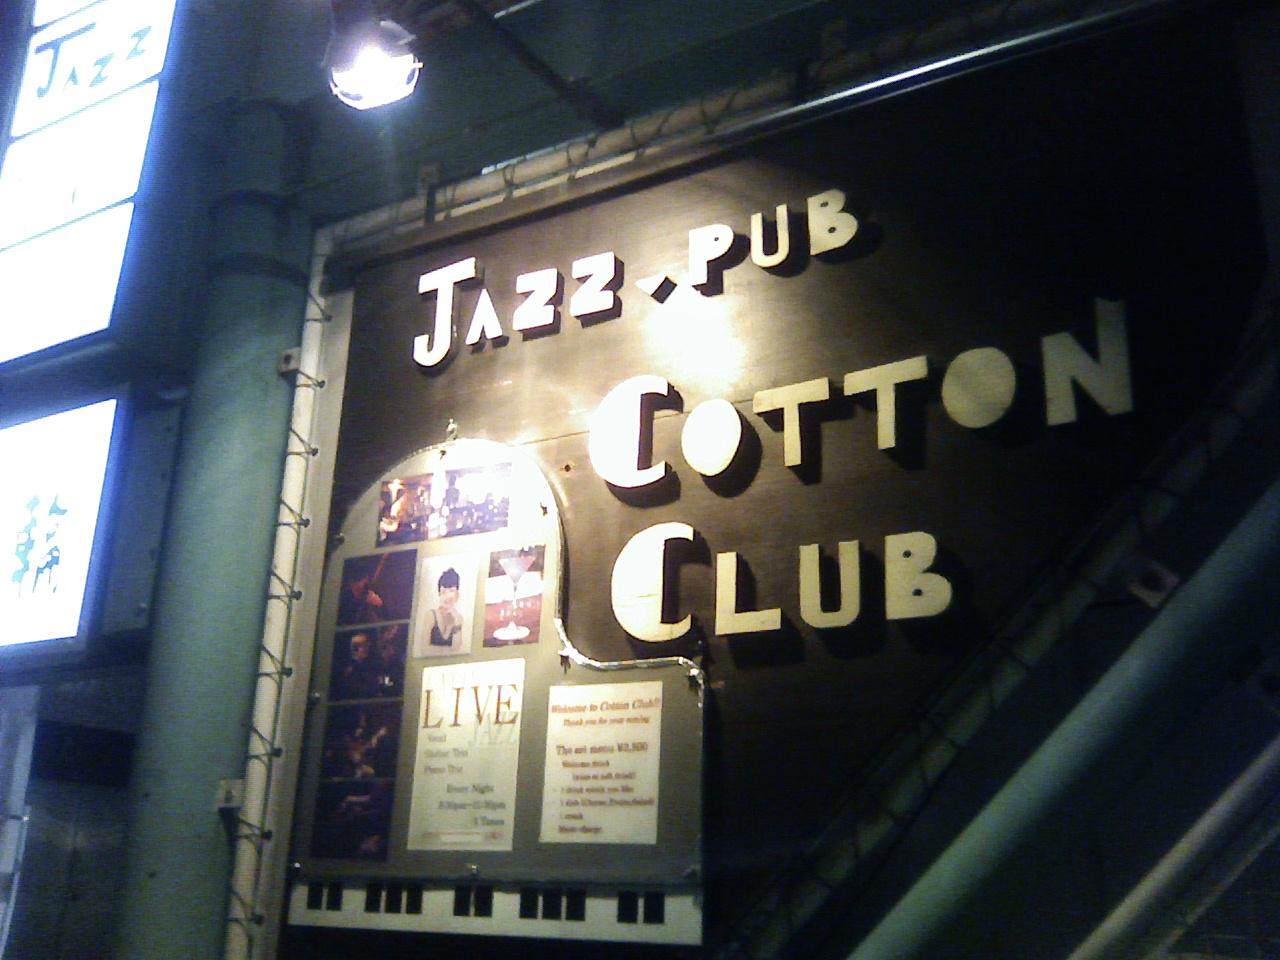 JAZZ&PUB�@COTTON�@CLUB